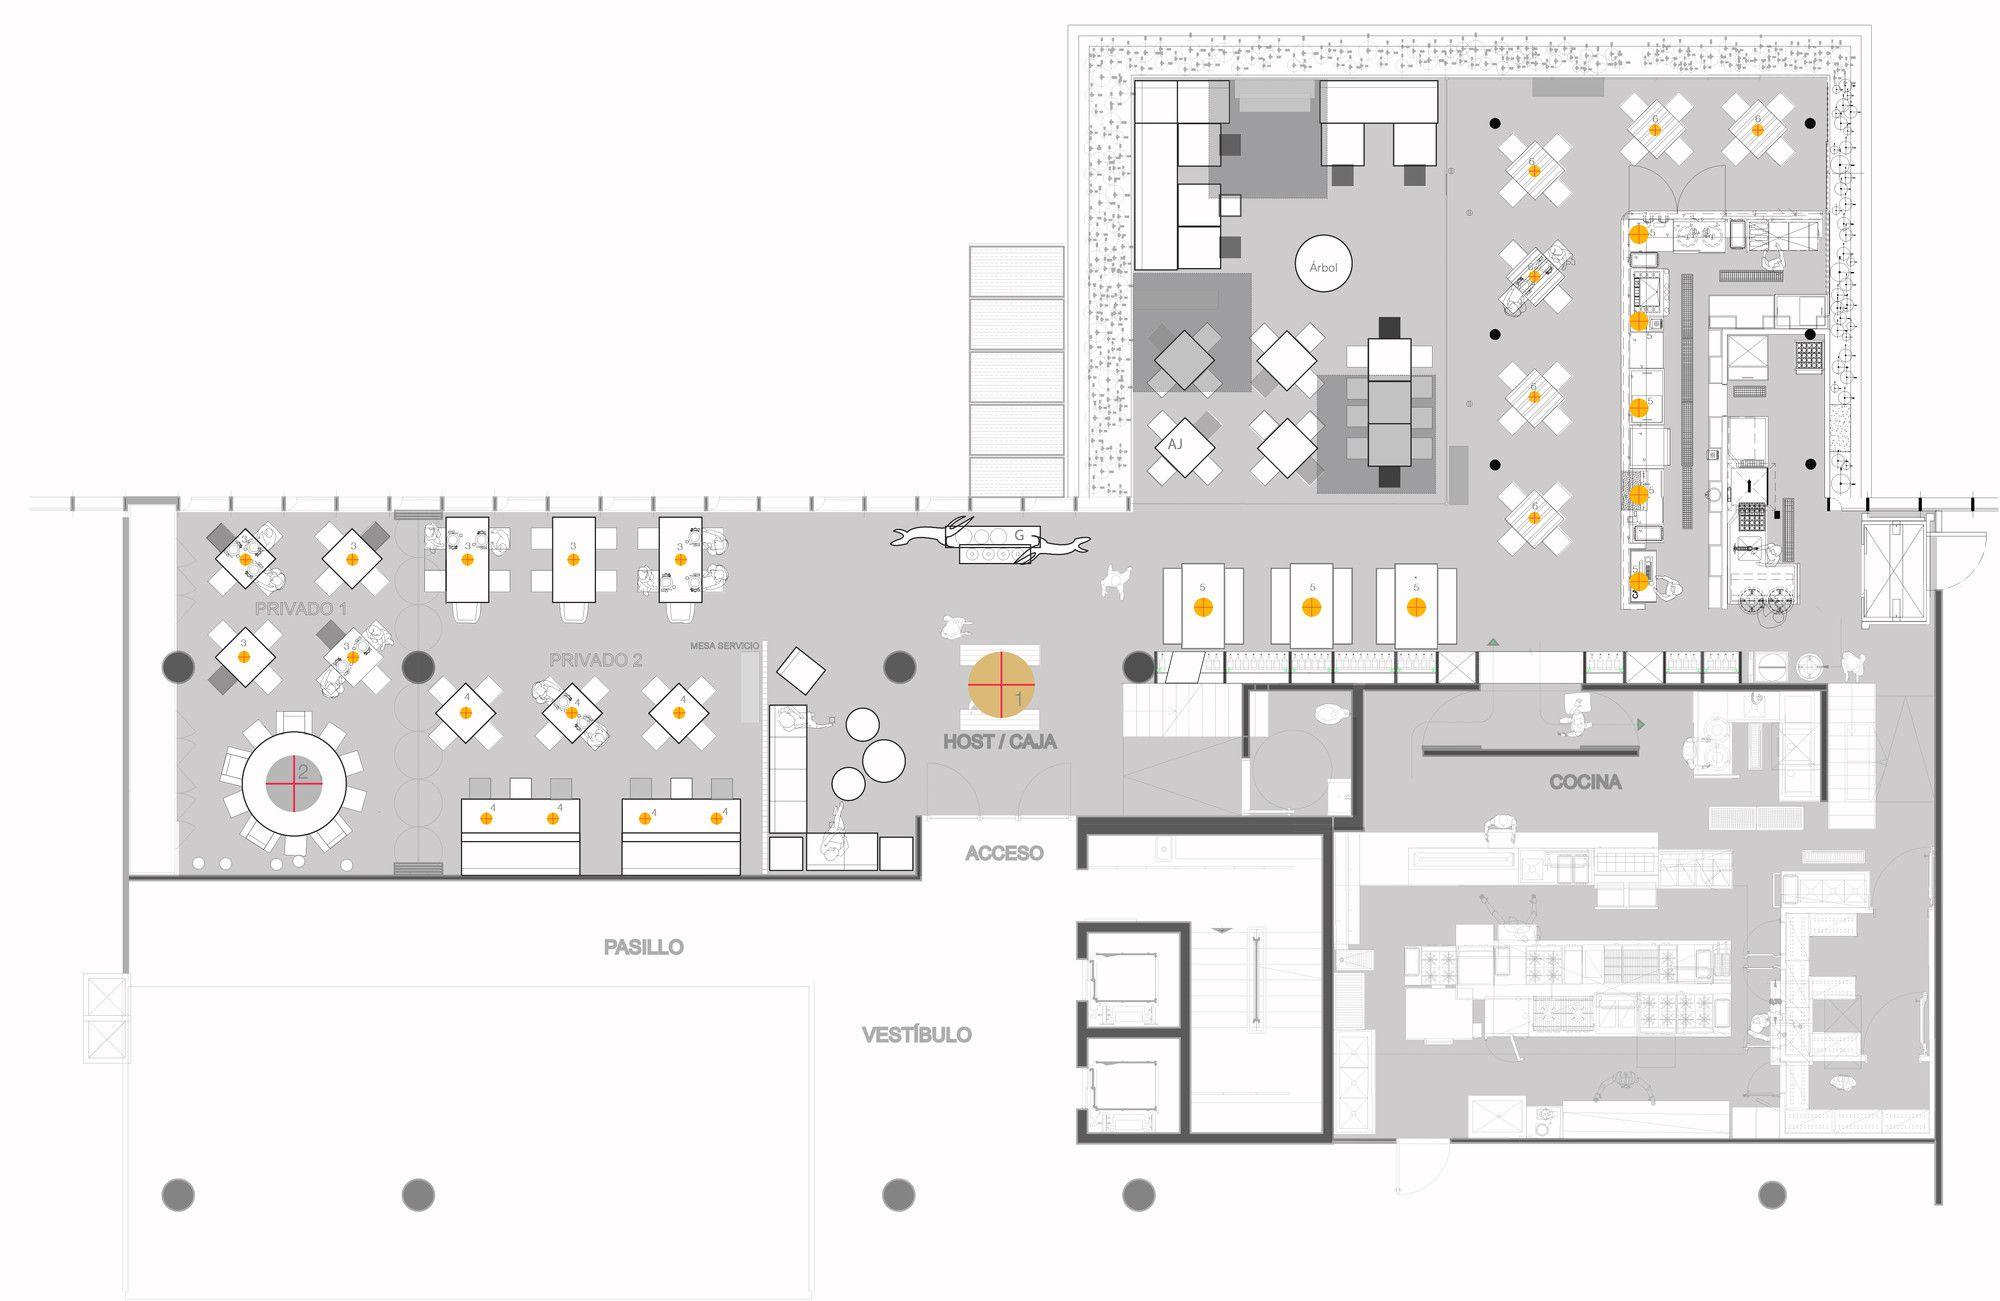 Galería - Asador Vasco / RootStudio - 19 | restaurantes | Pinterest